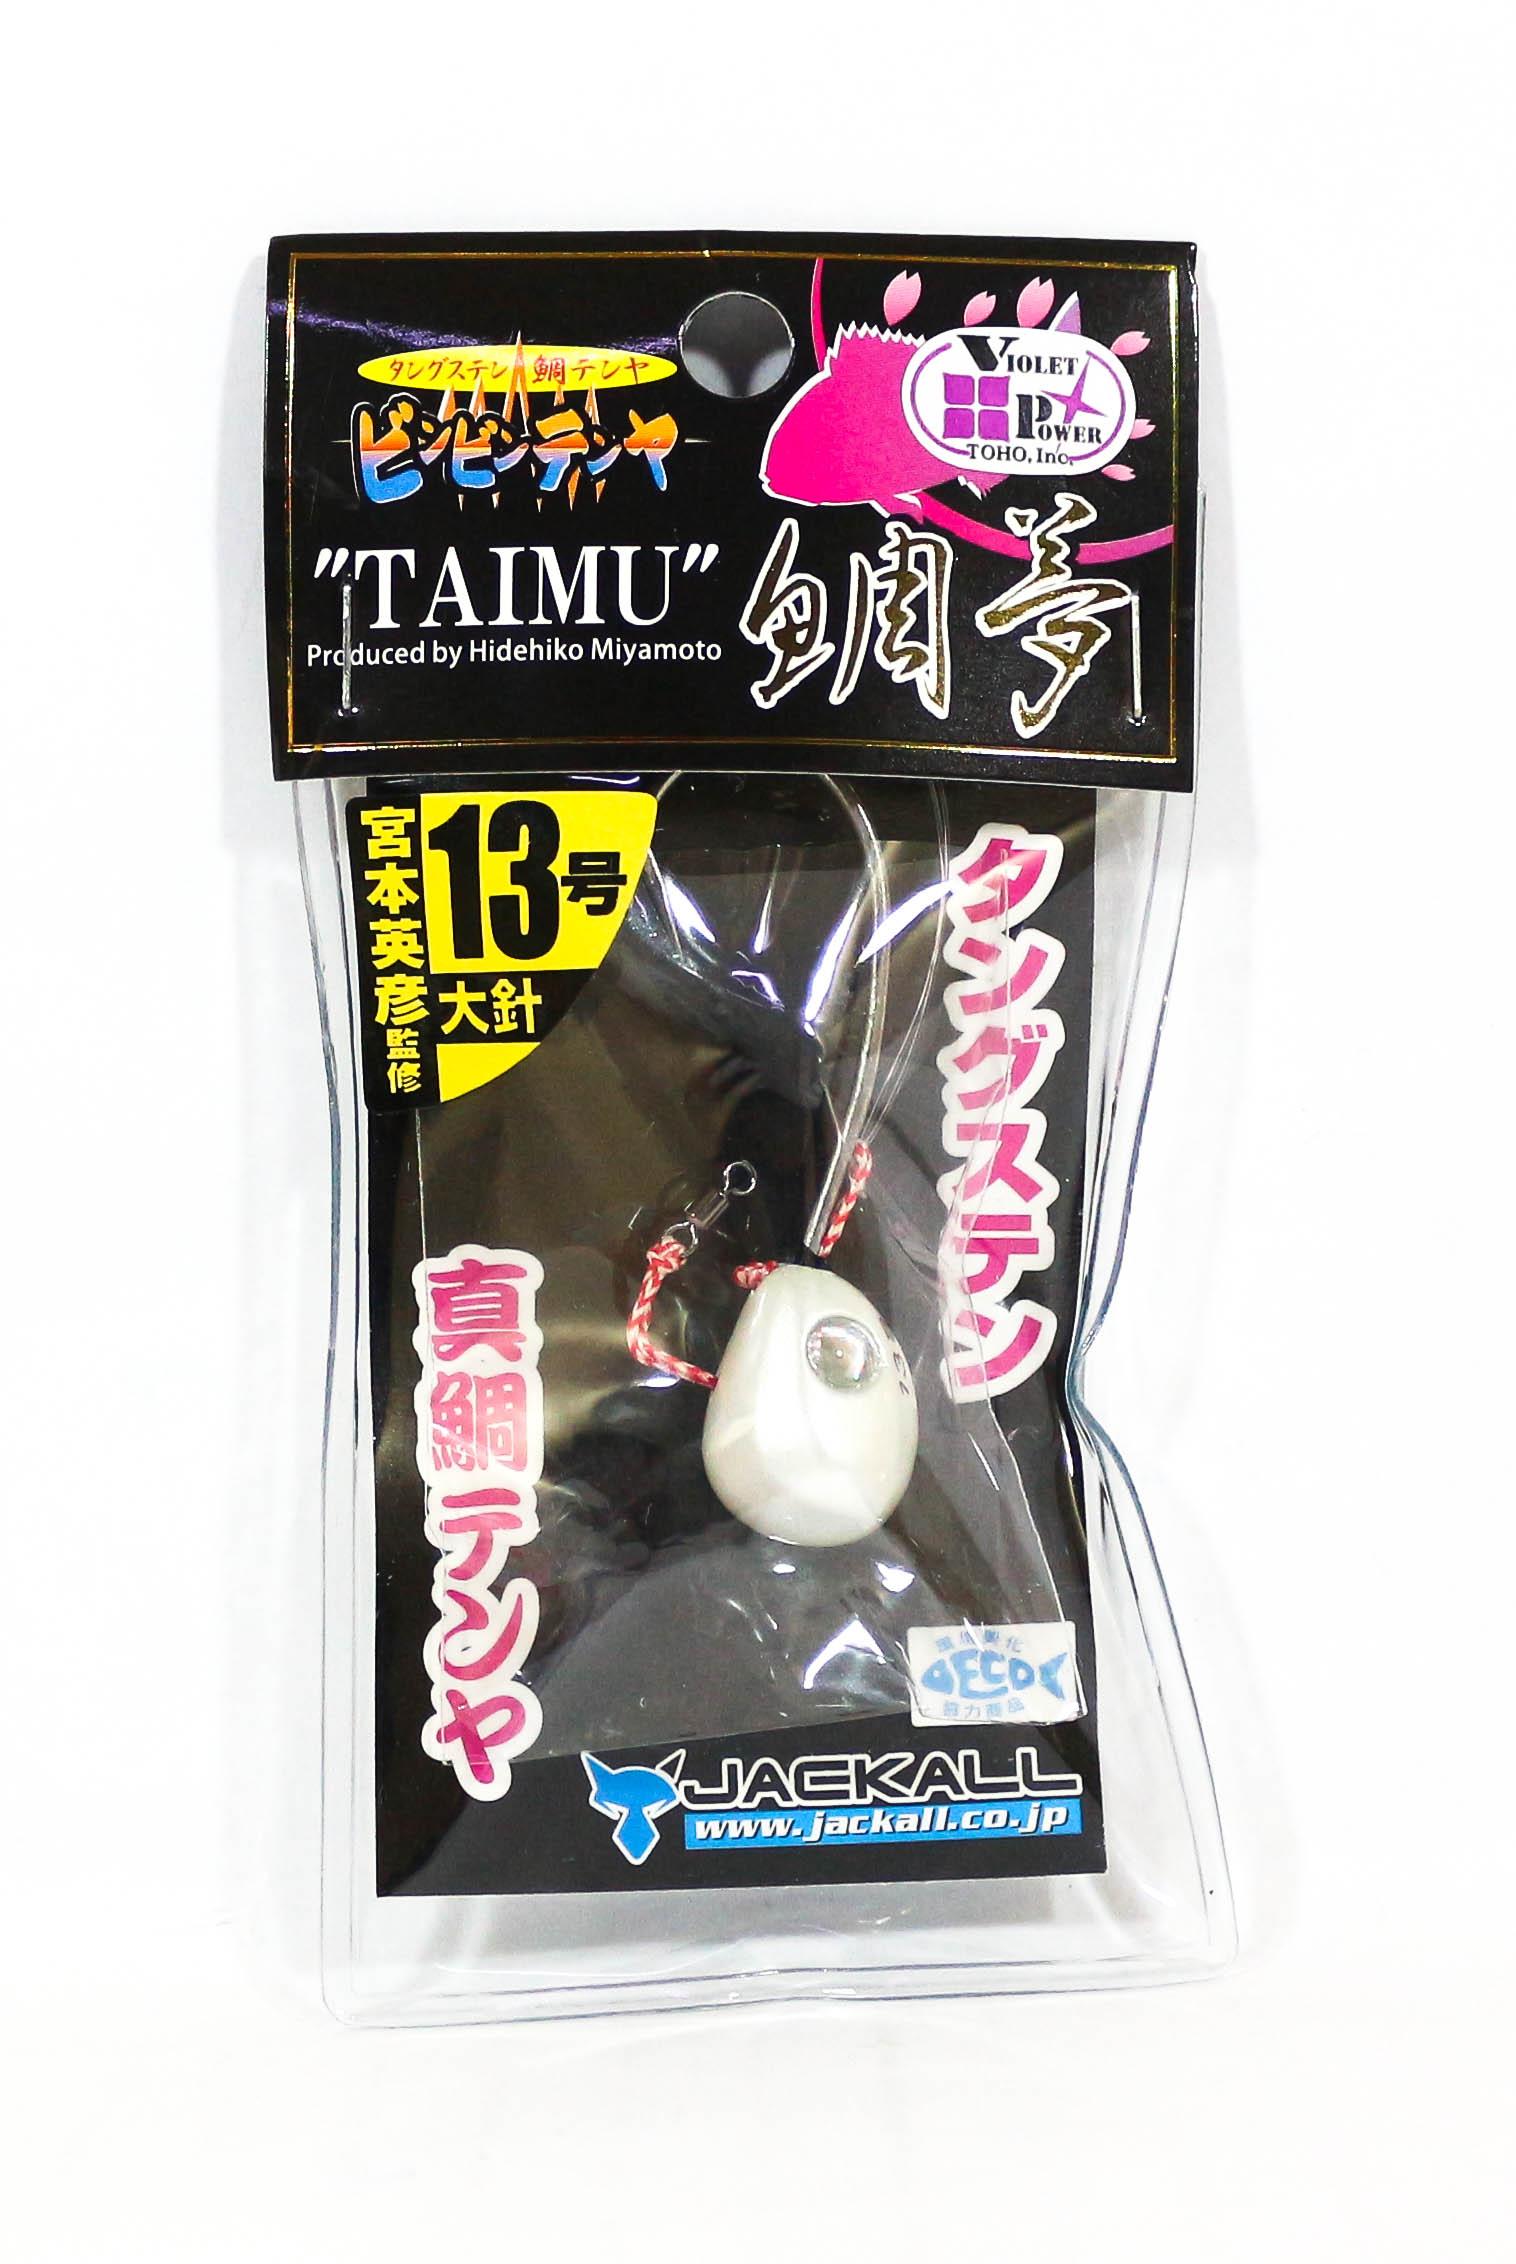 Jackall Bin Bin Tenya Taimu No. 13 L Super White (8367)